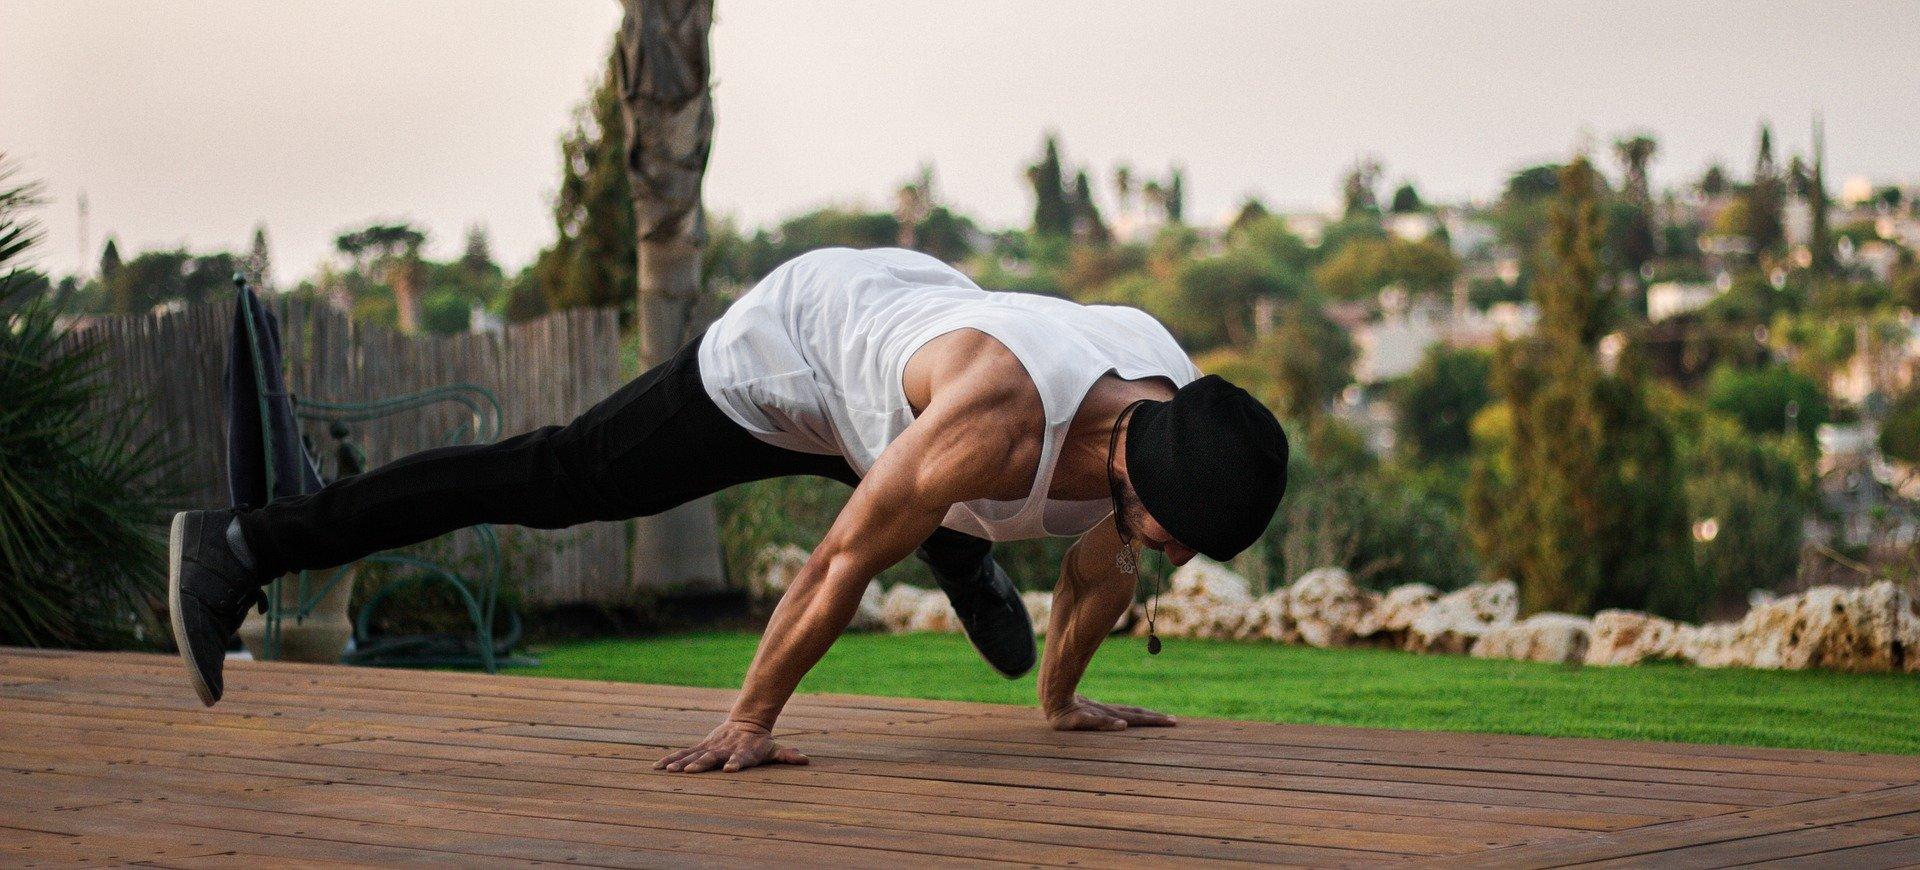 street workout 2628904 1920 초보 운동 루틴 No.1 가이드(계획,스케줄, 운동법)